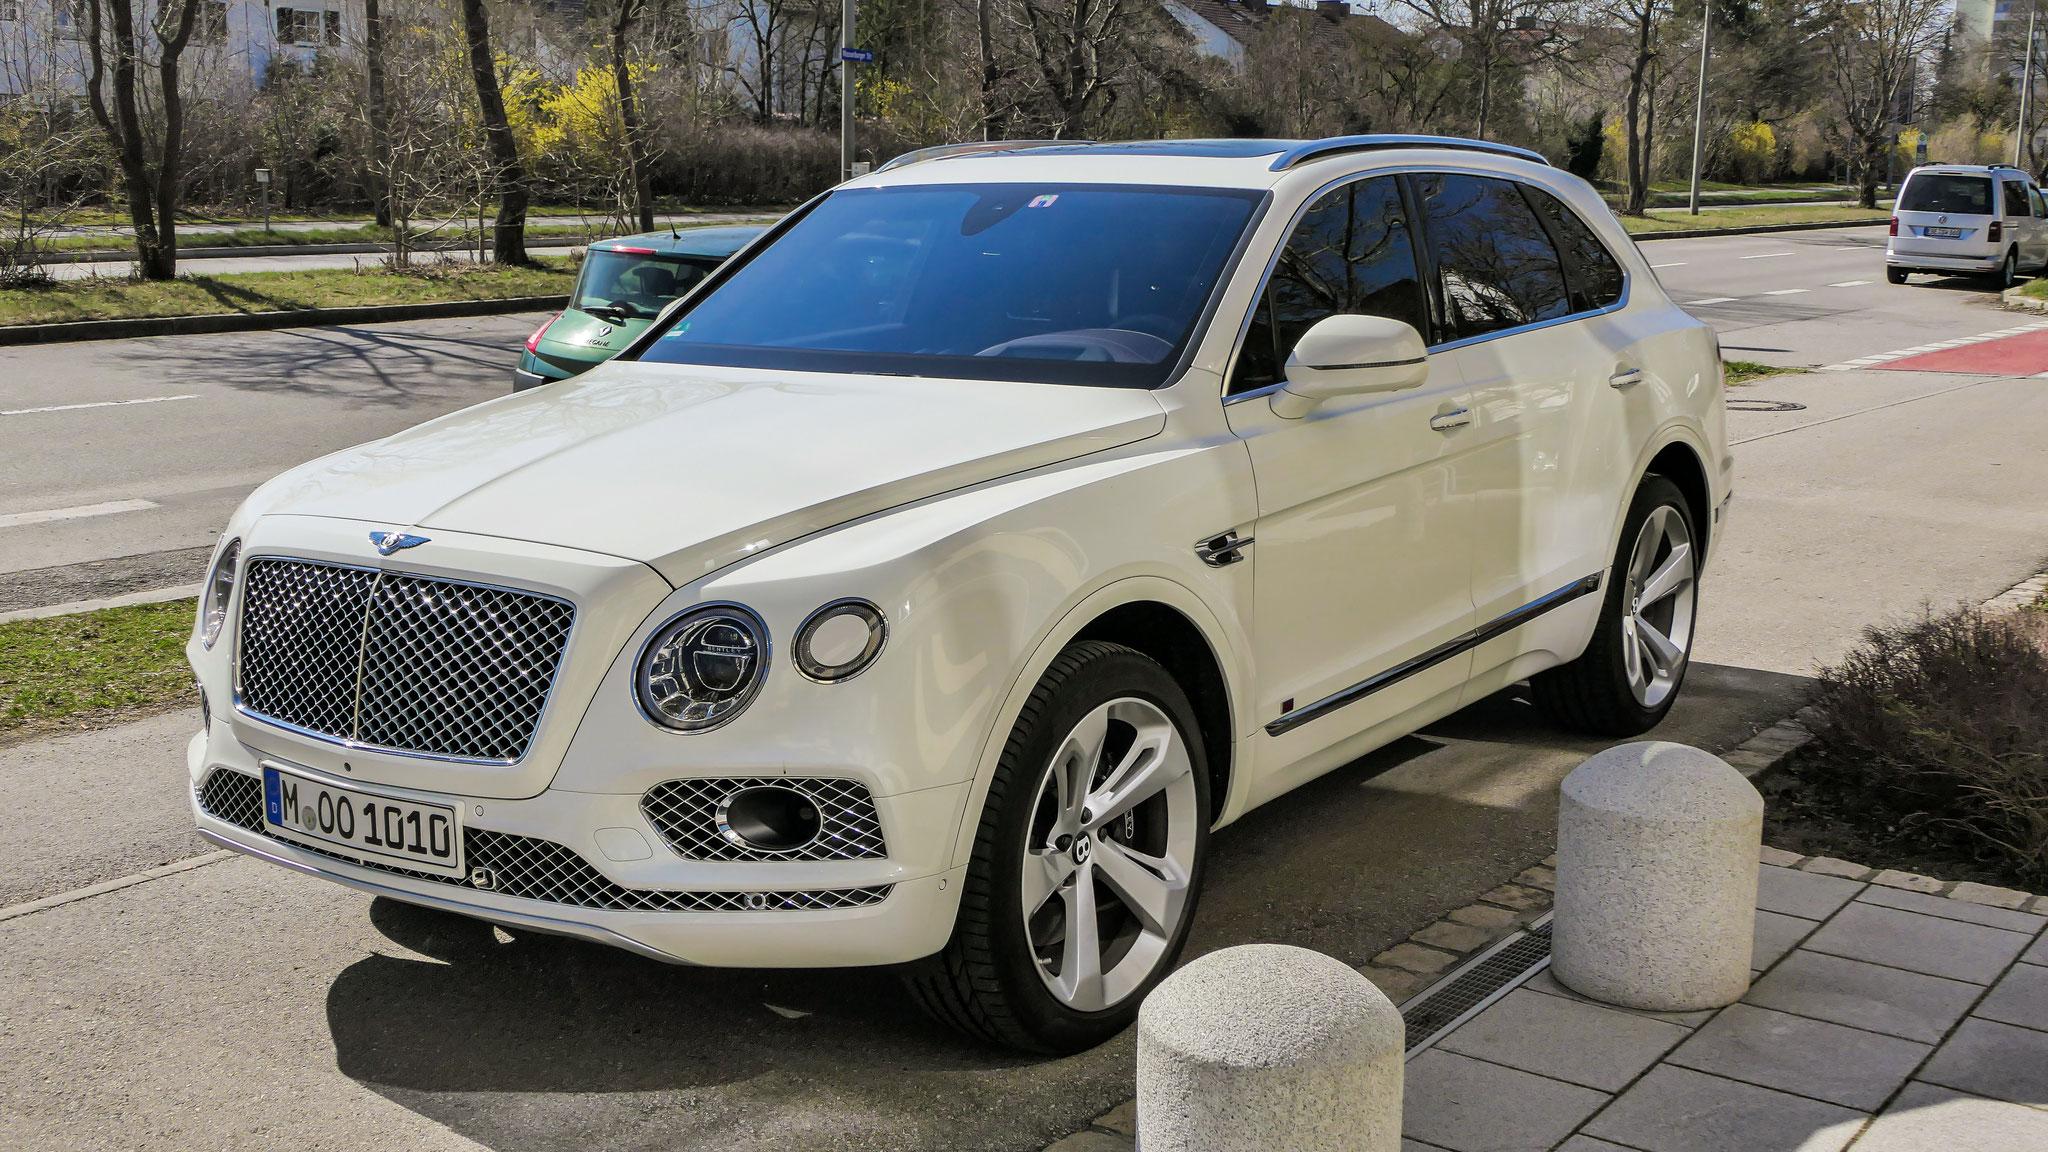 Bentley Bentayga - M-OO-1010